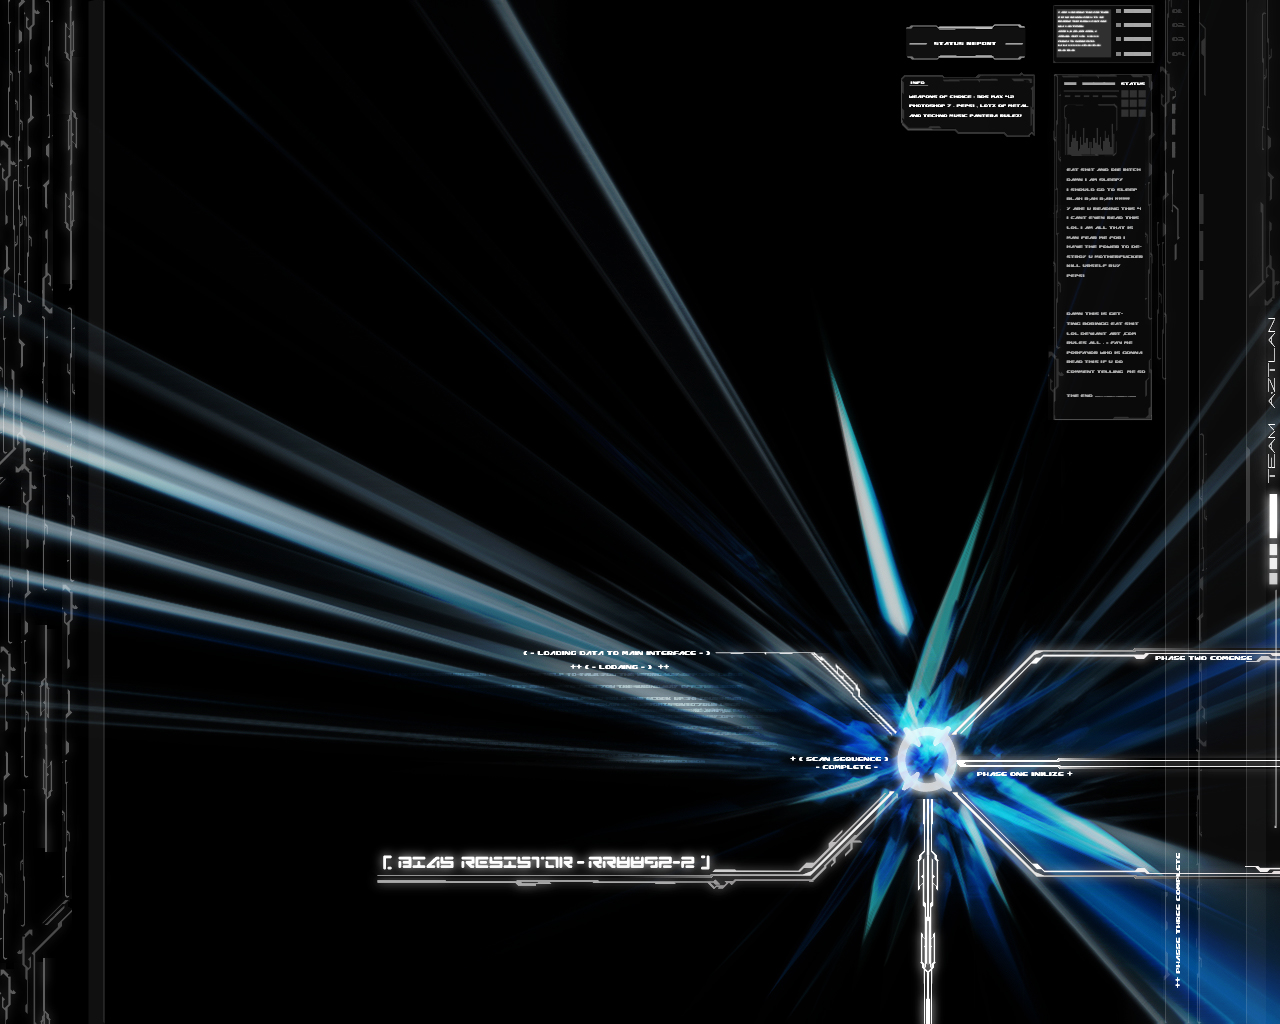 bias resistor rr8892 2 remix 1280x1024 Anime wallpapers Anime 1280x1024